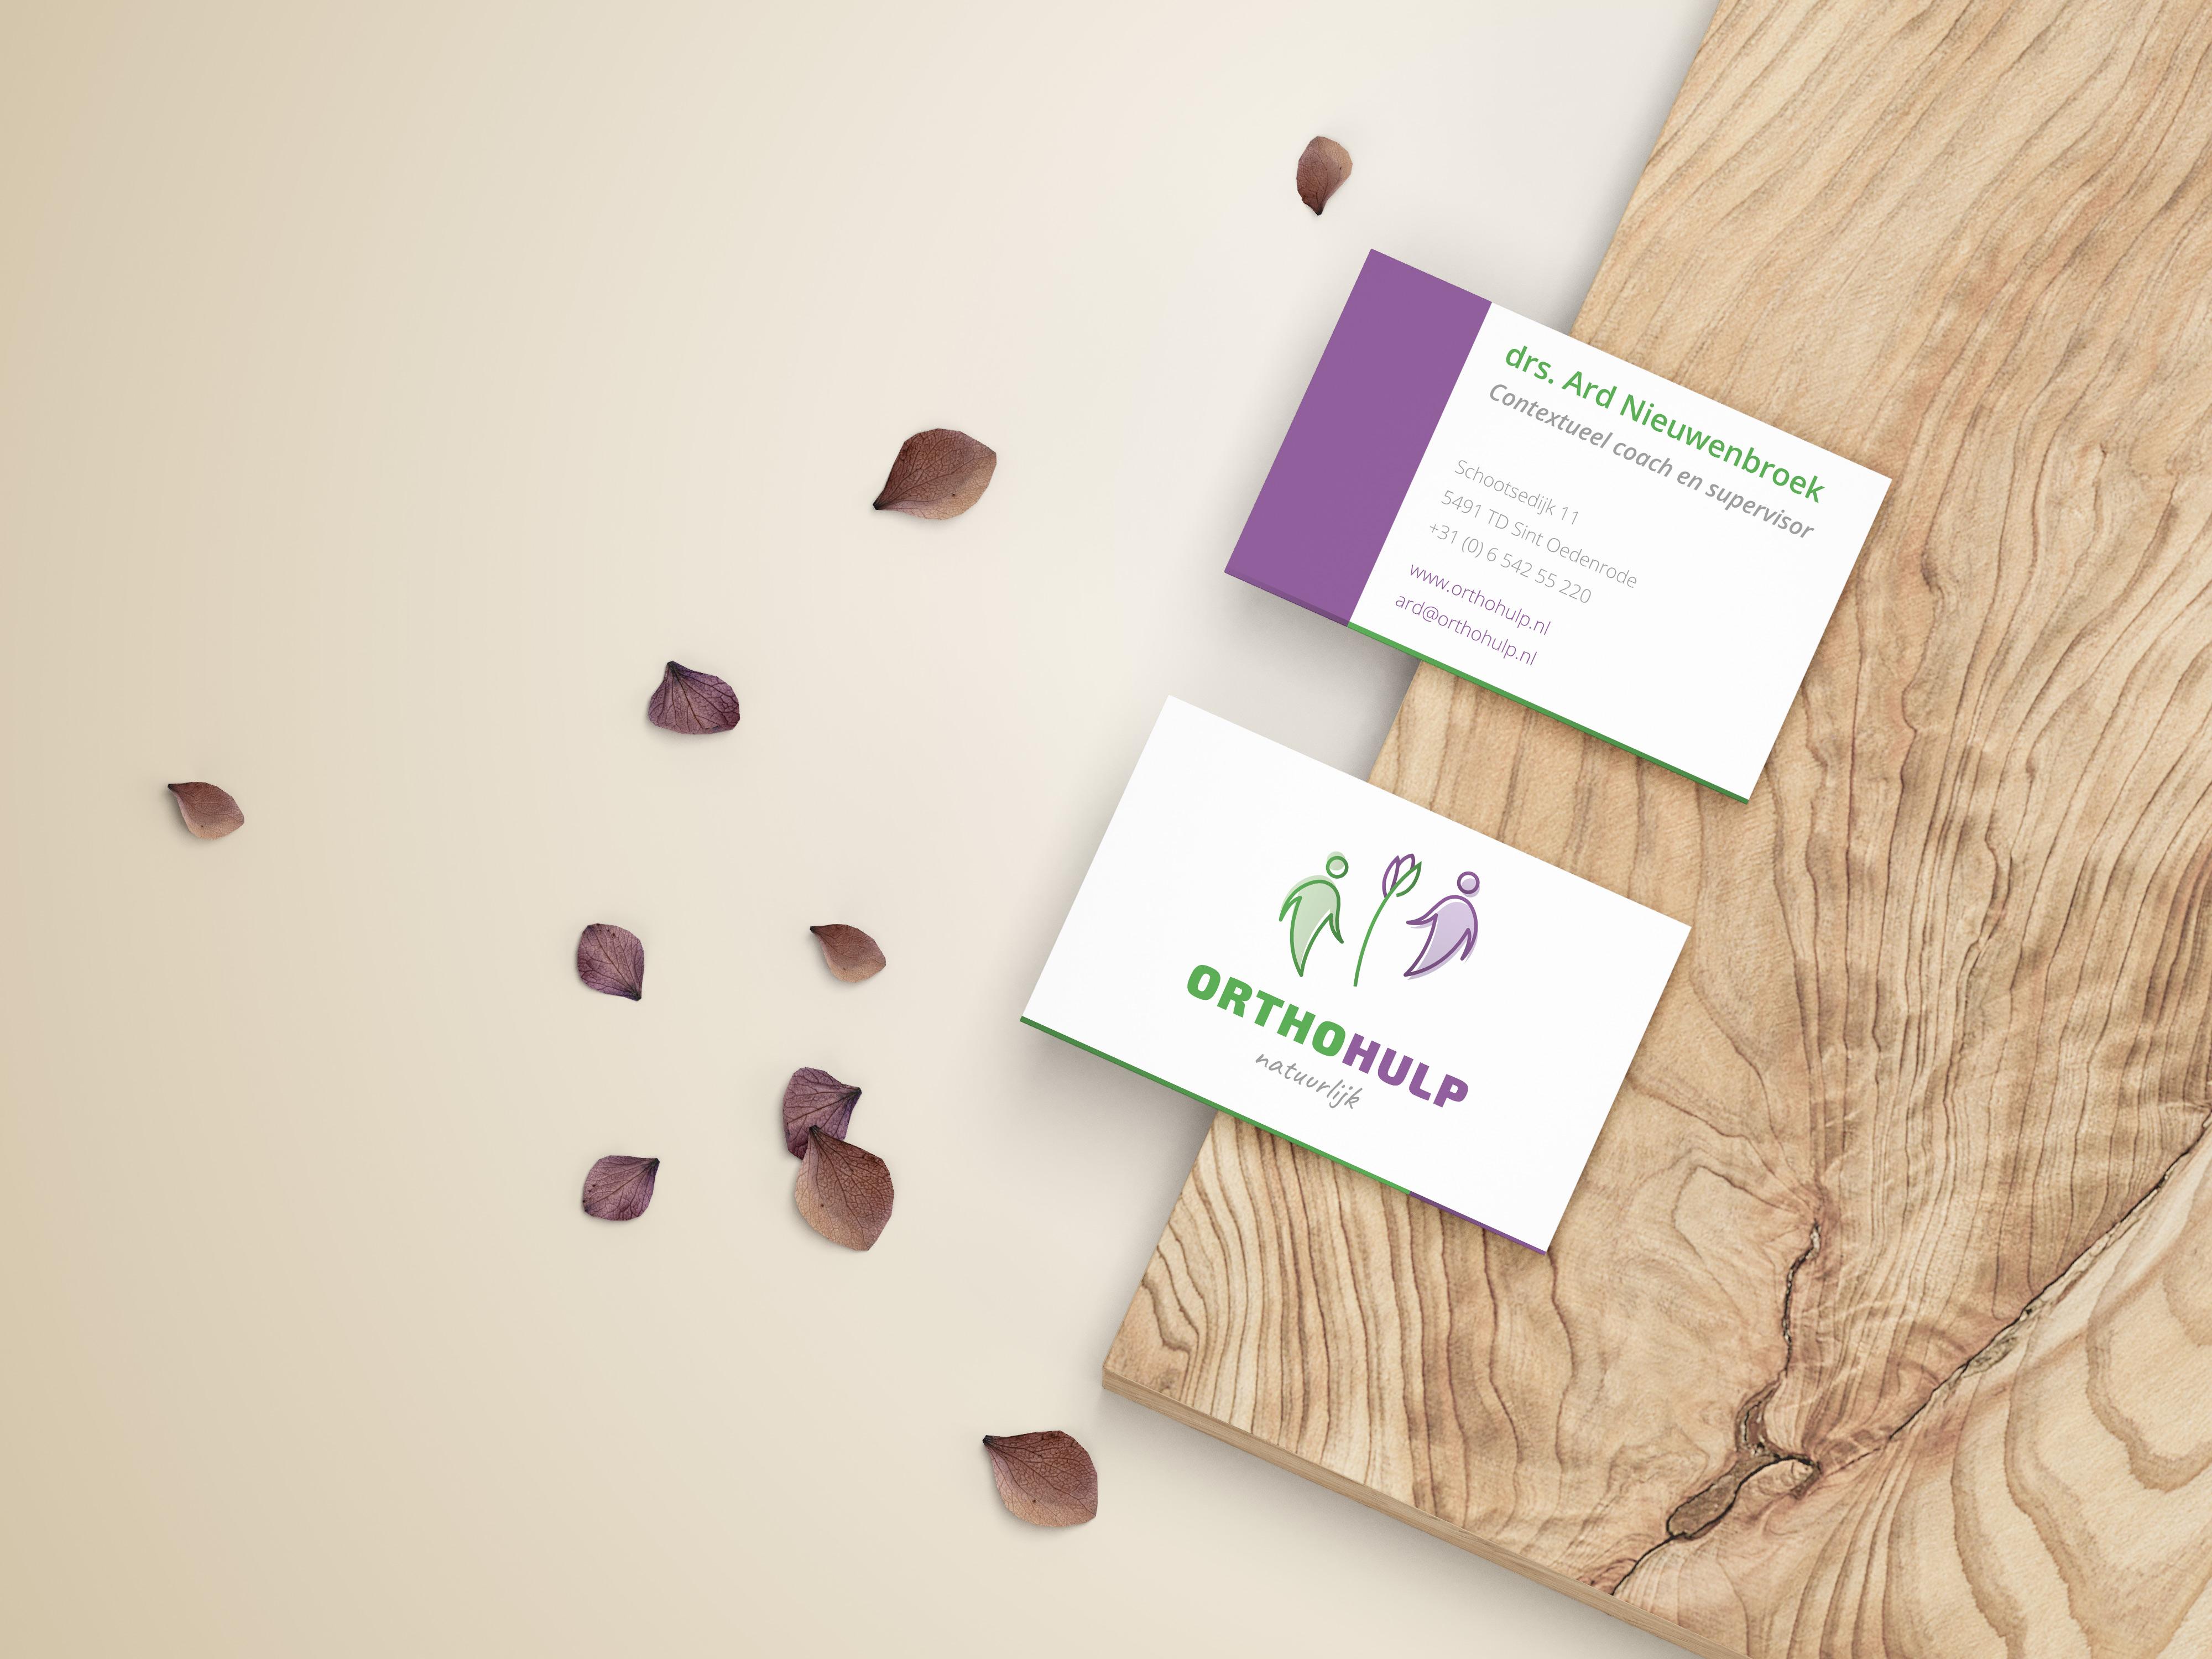 Visitekaartje voor OrthoHulp | Dualler